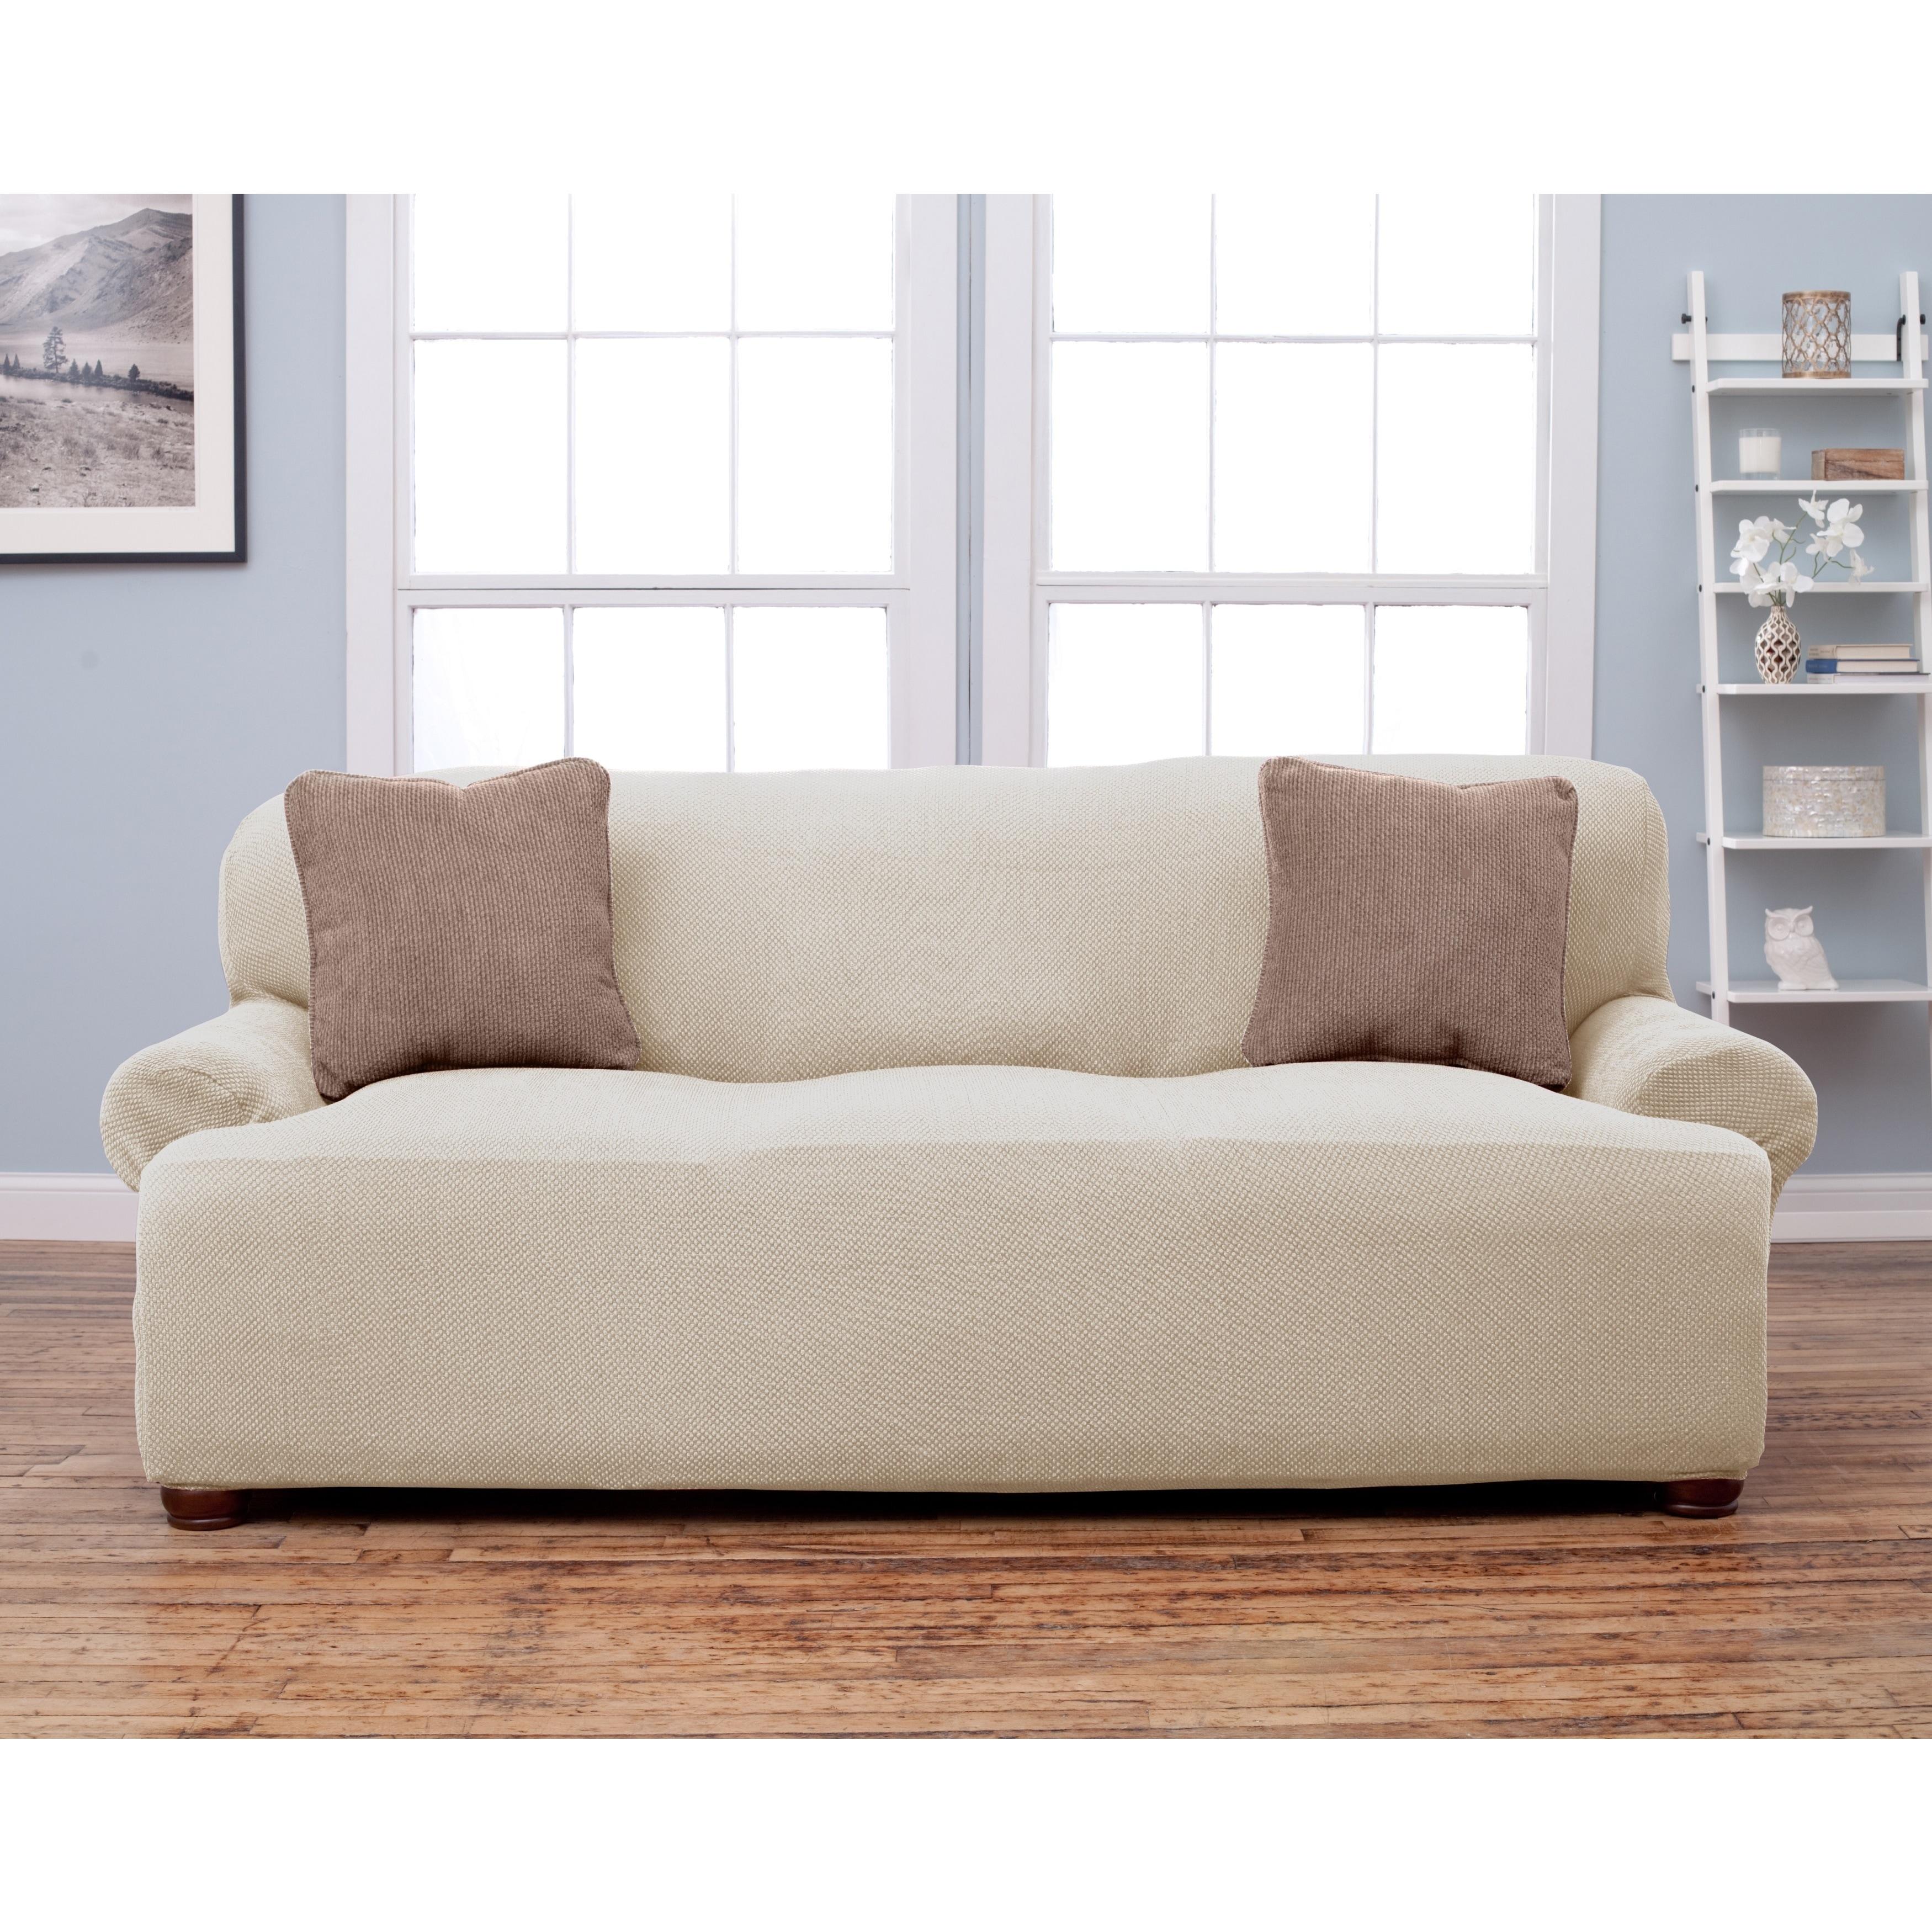 Shop Home Fashion Designs Stretch Sofa Slipcover - Free Shipping On ...